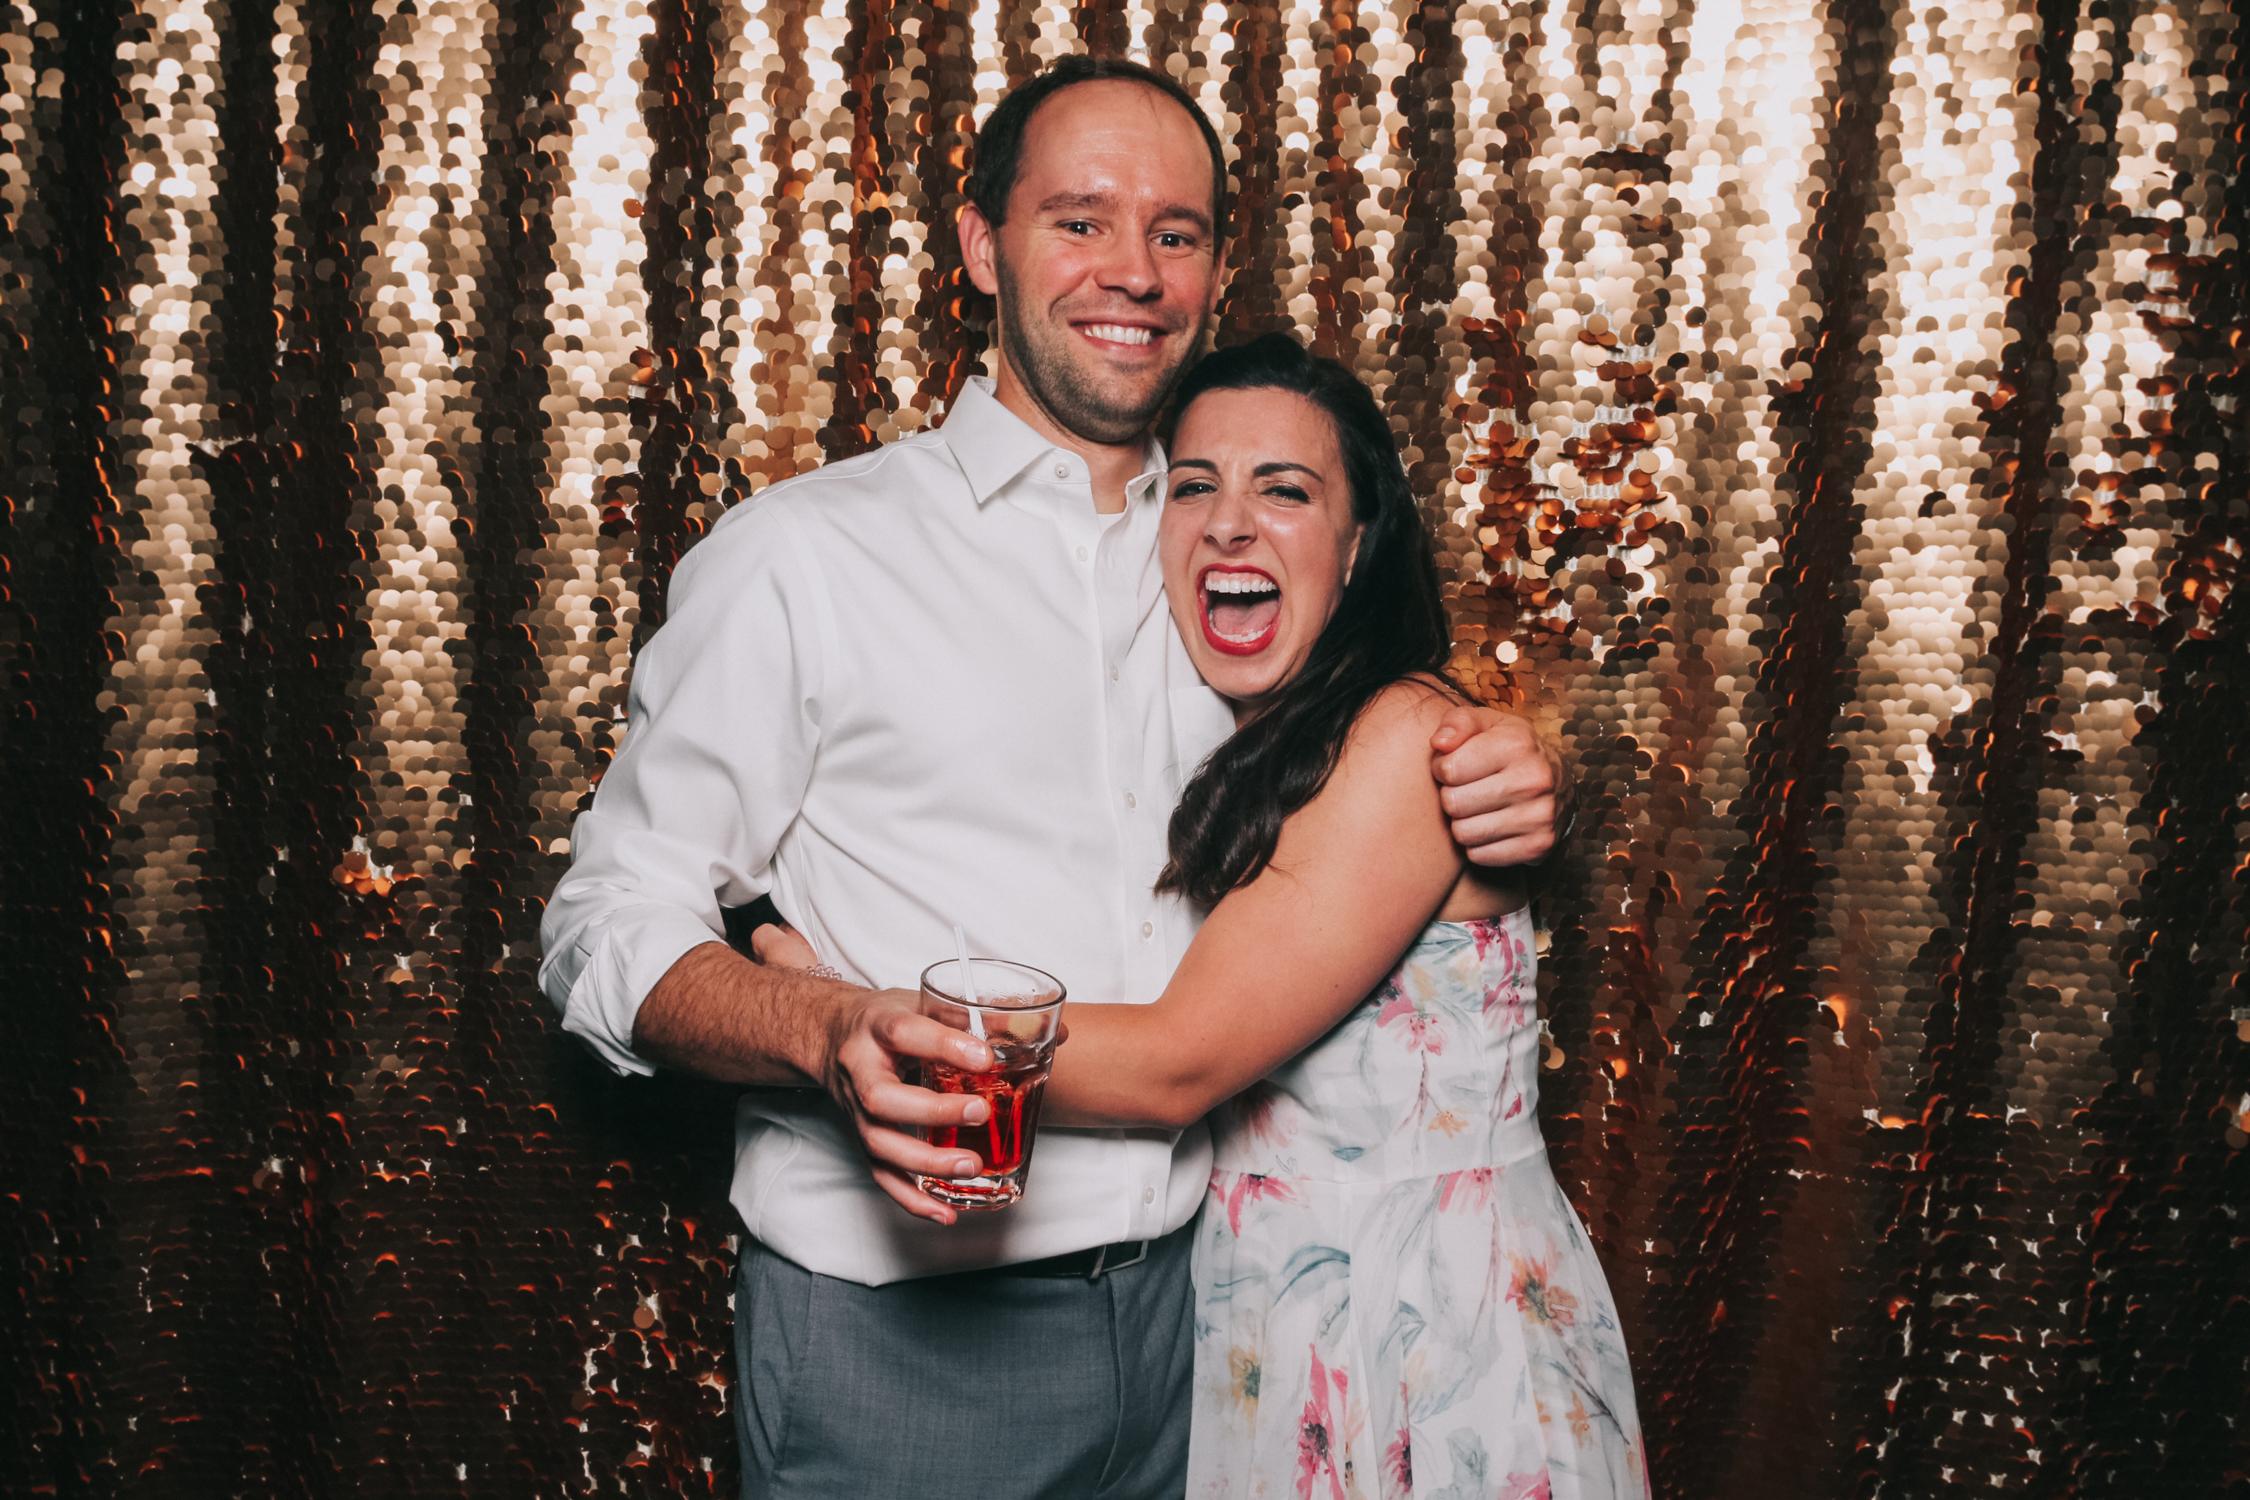 baltimore rusty scupper wedding photo booth-46.jpg